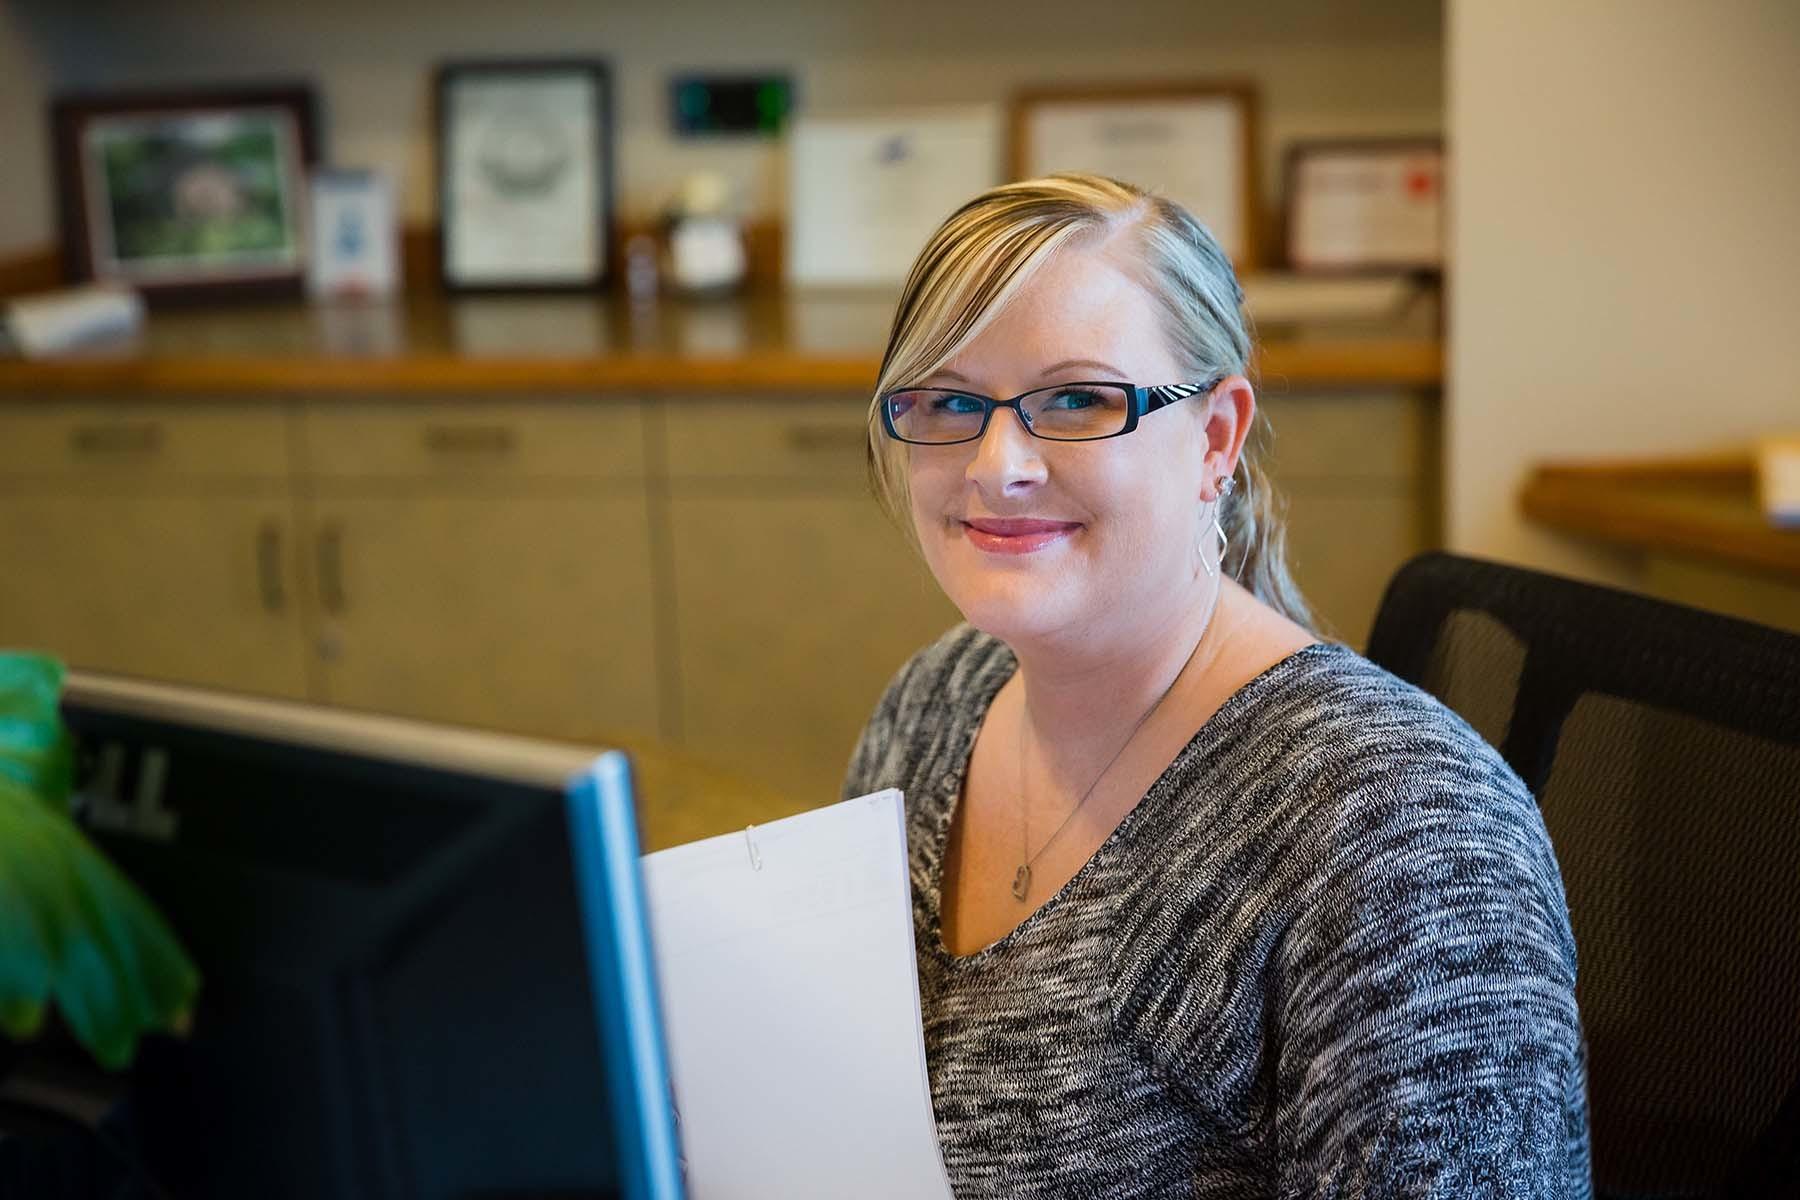 Secretary Smiling In Office